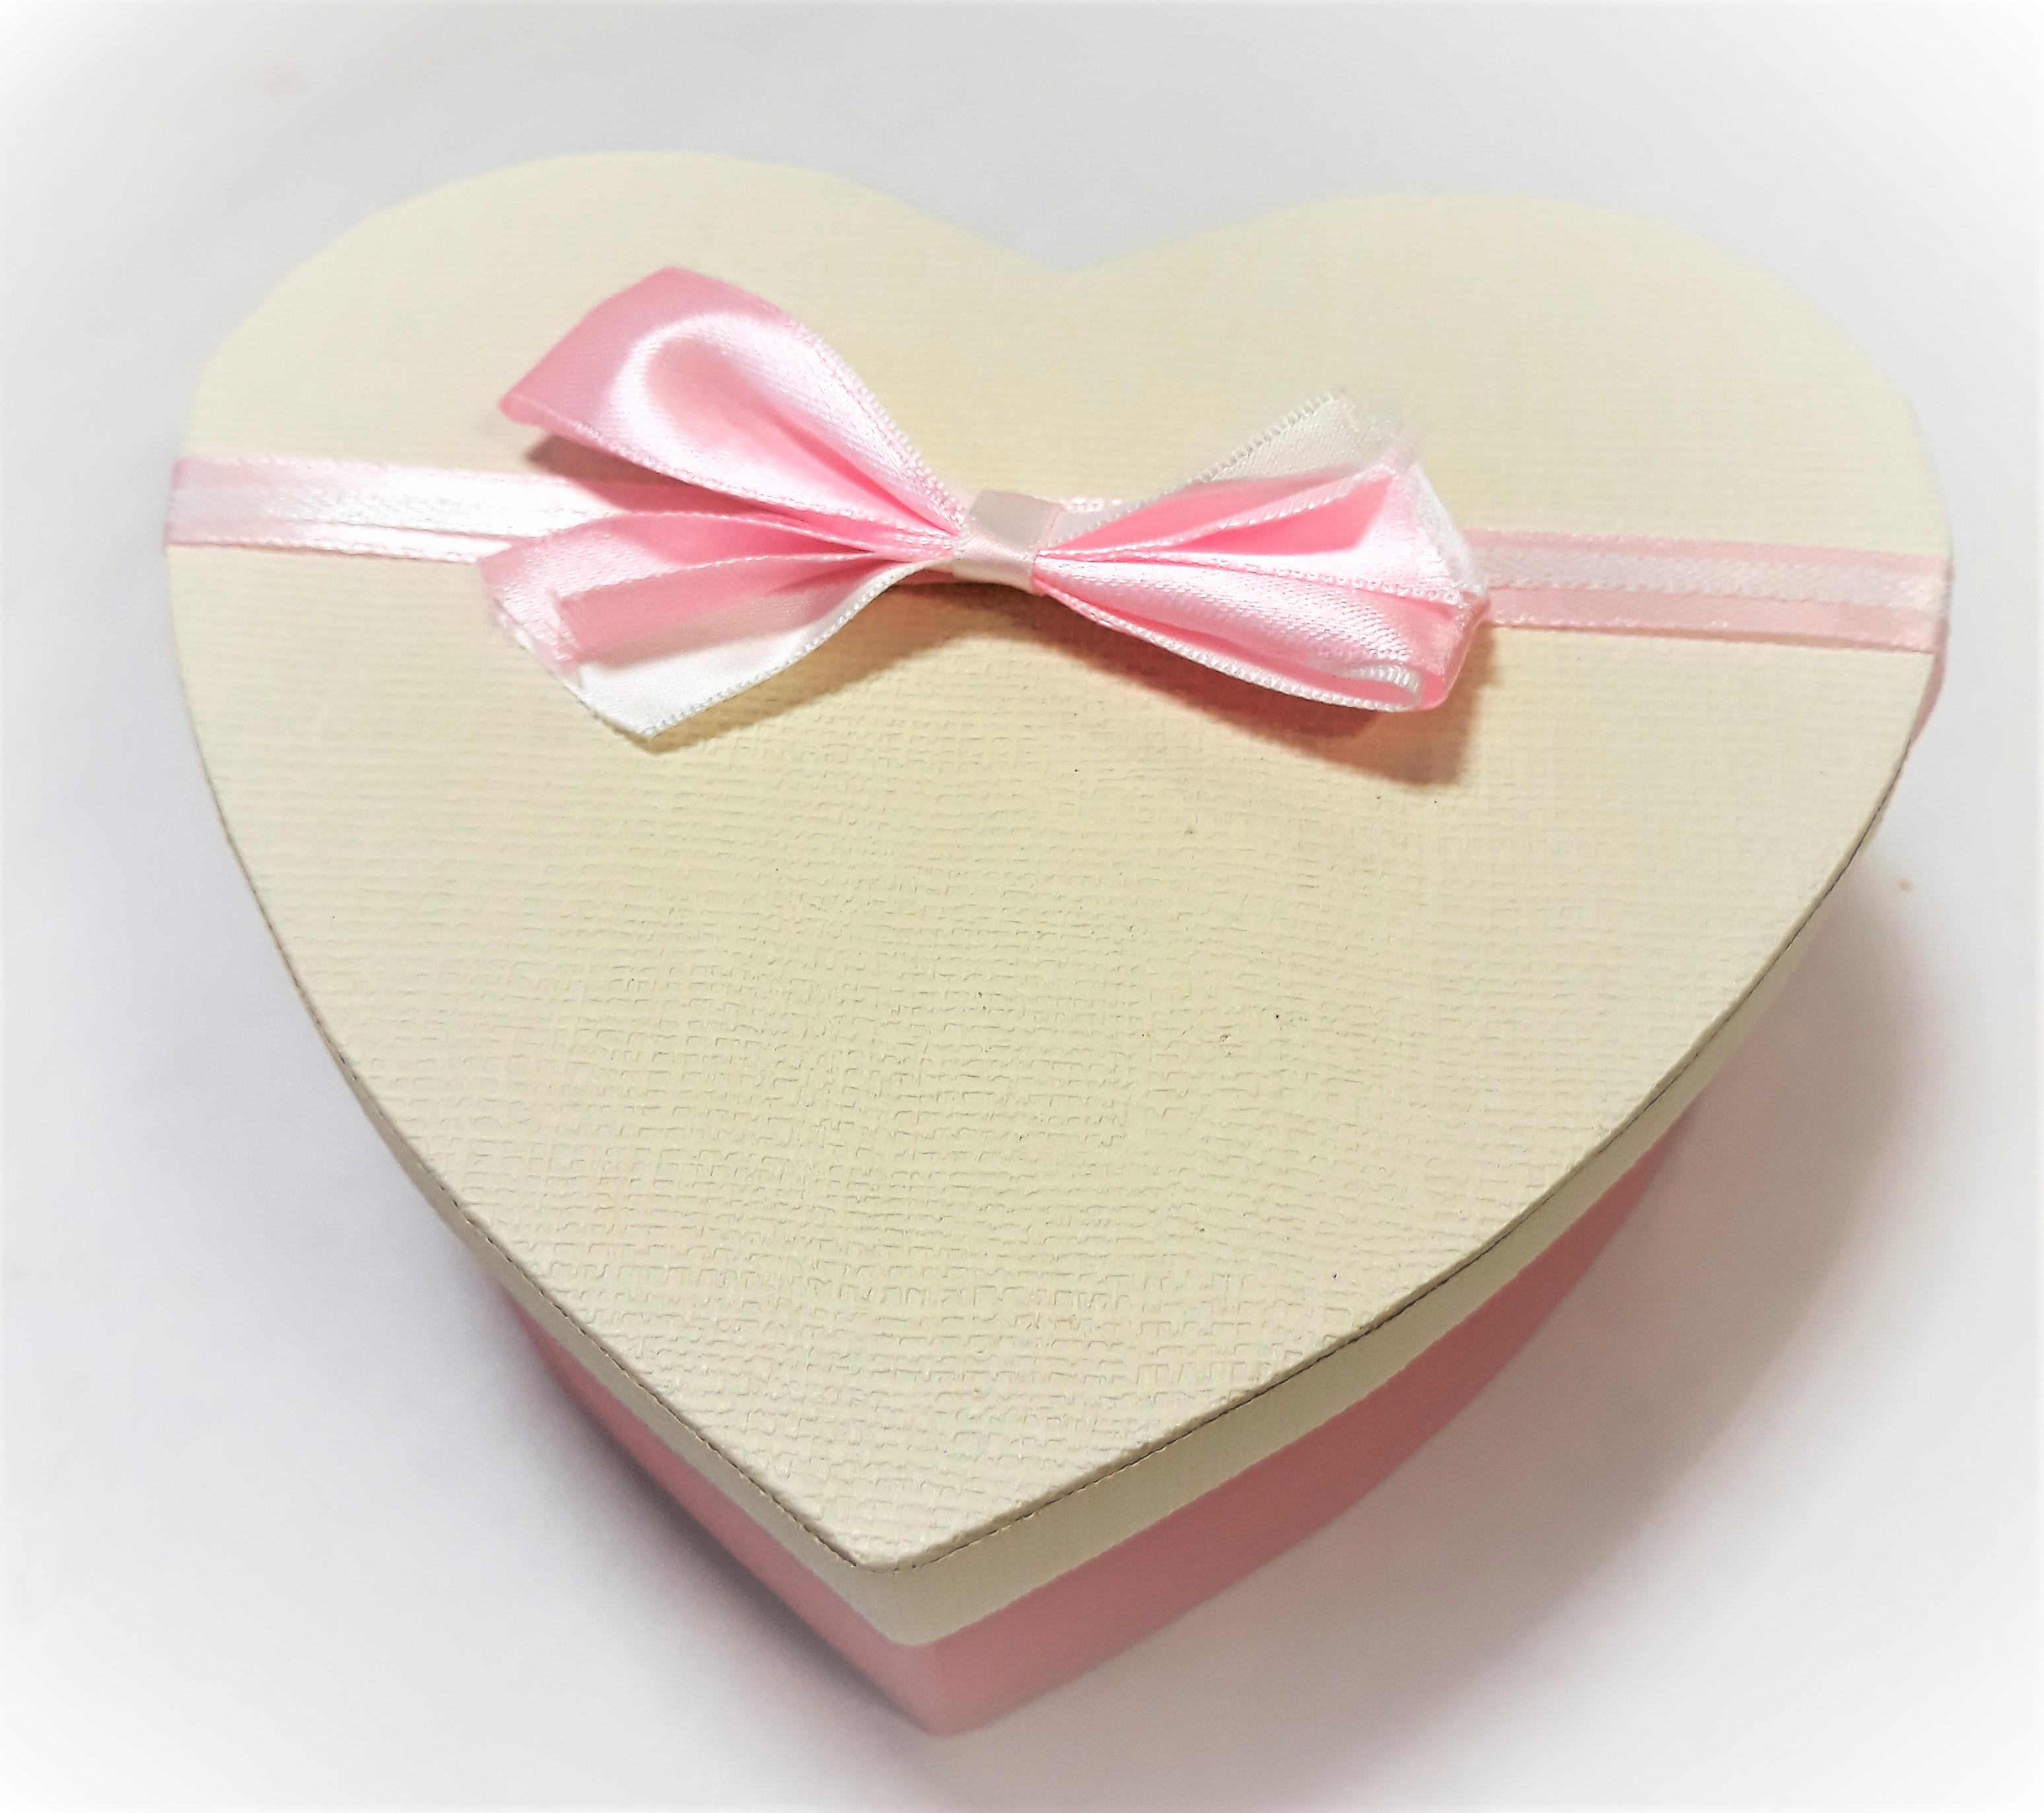 Srdcekrabicka